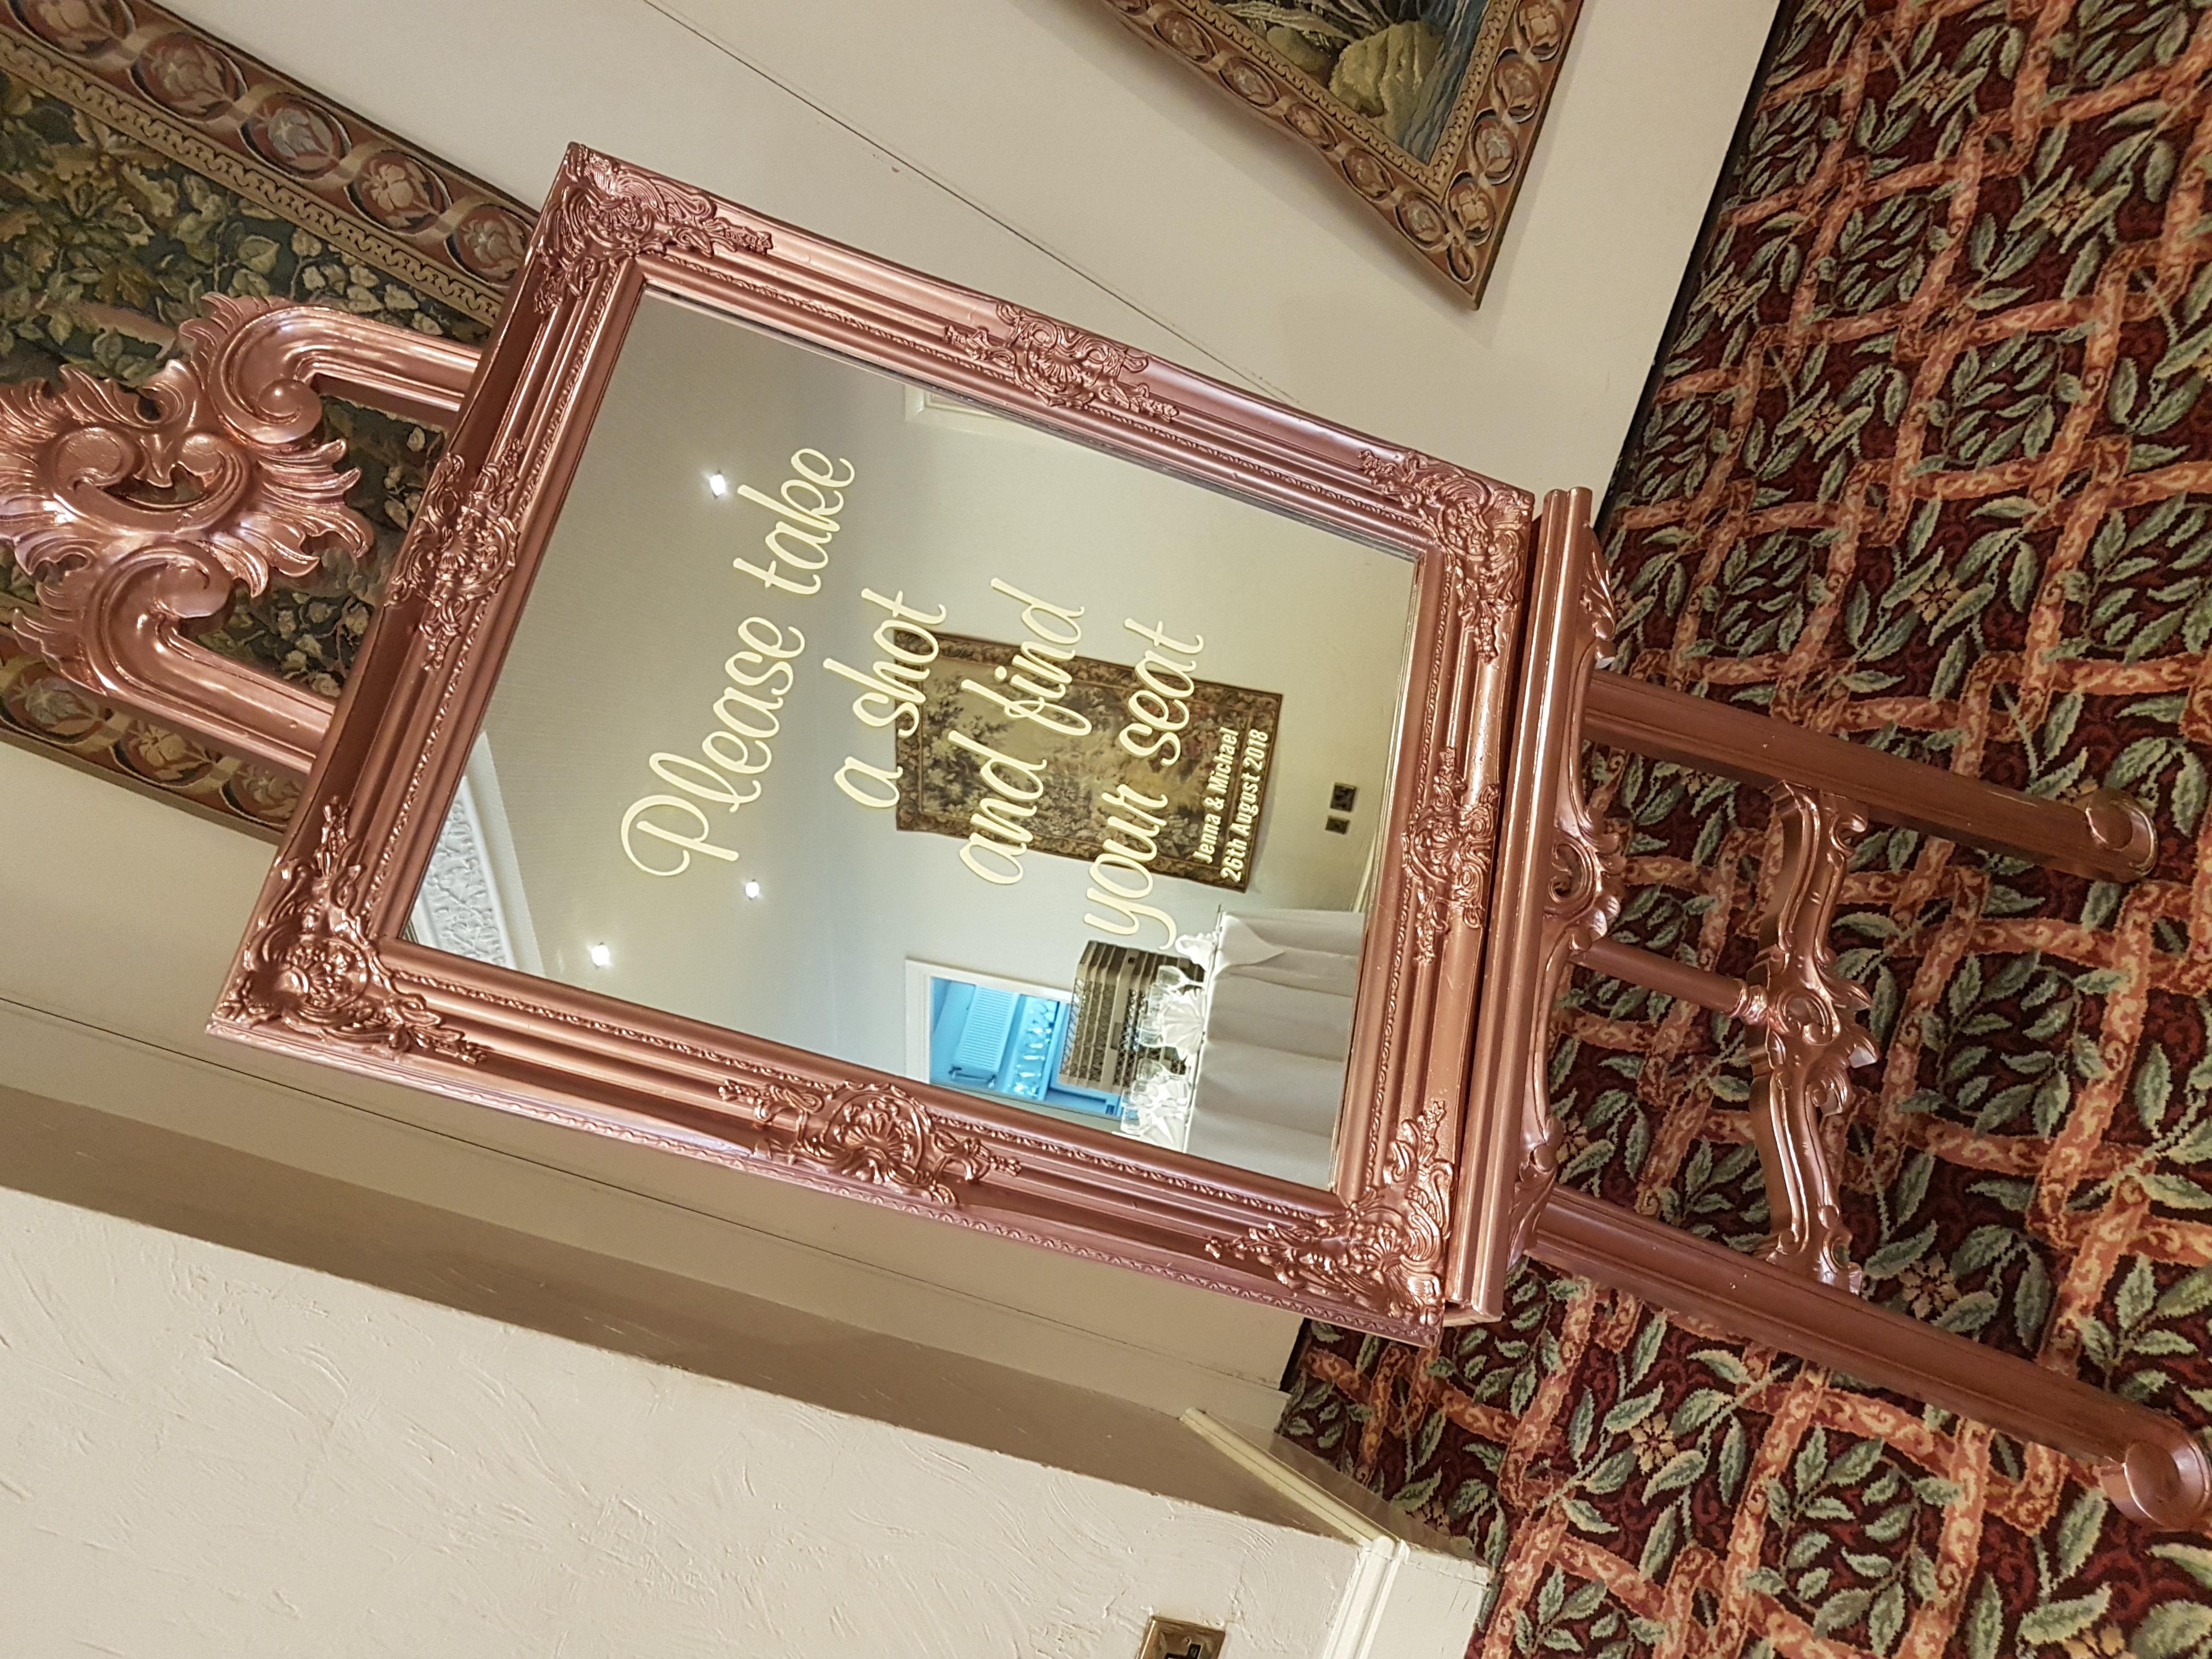 Vinyl sign on rose gold mirror